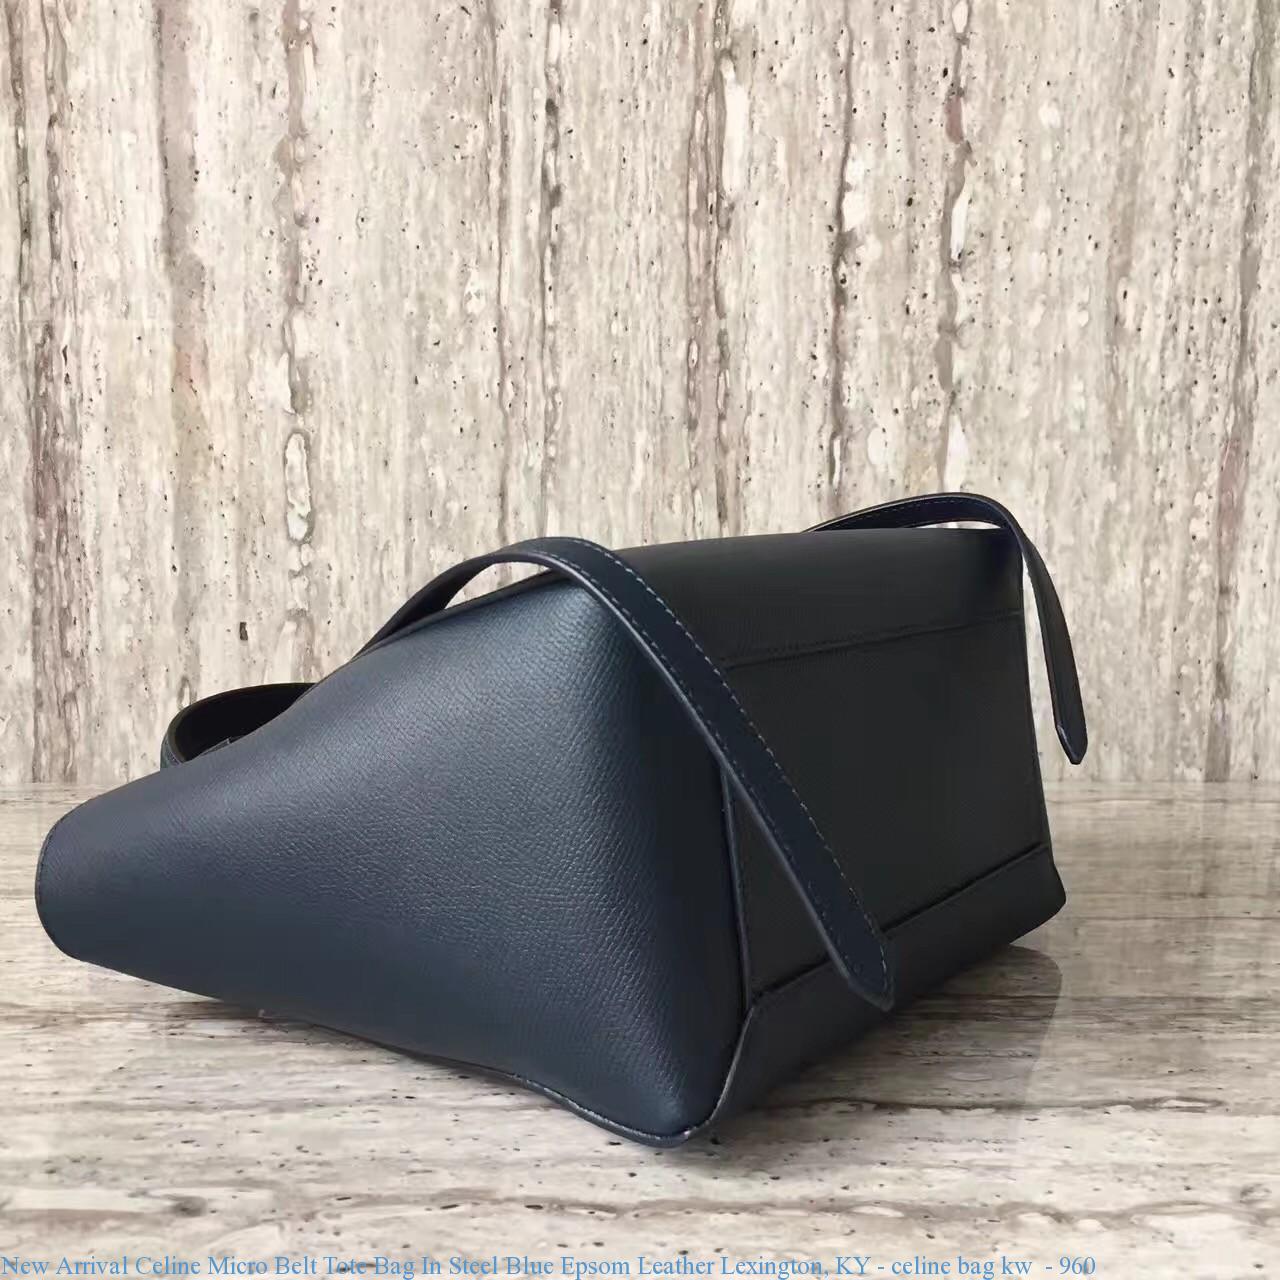 New Arrival Celine Micro Belt Tote Bag In Steel Blue Epsom Leather Lexington Ky Celine Bag Kw 960 Buy Cheap Celine Replica Handbags Celine Bags Outlet Store Celine Bags